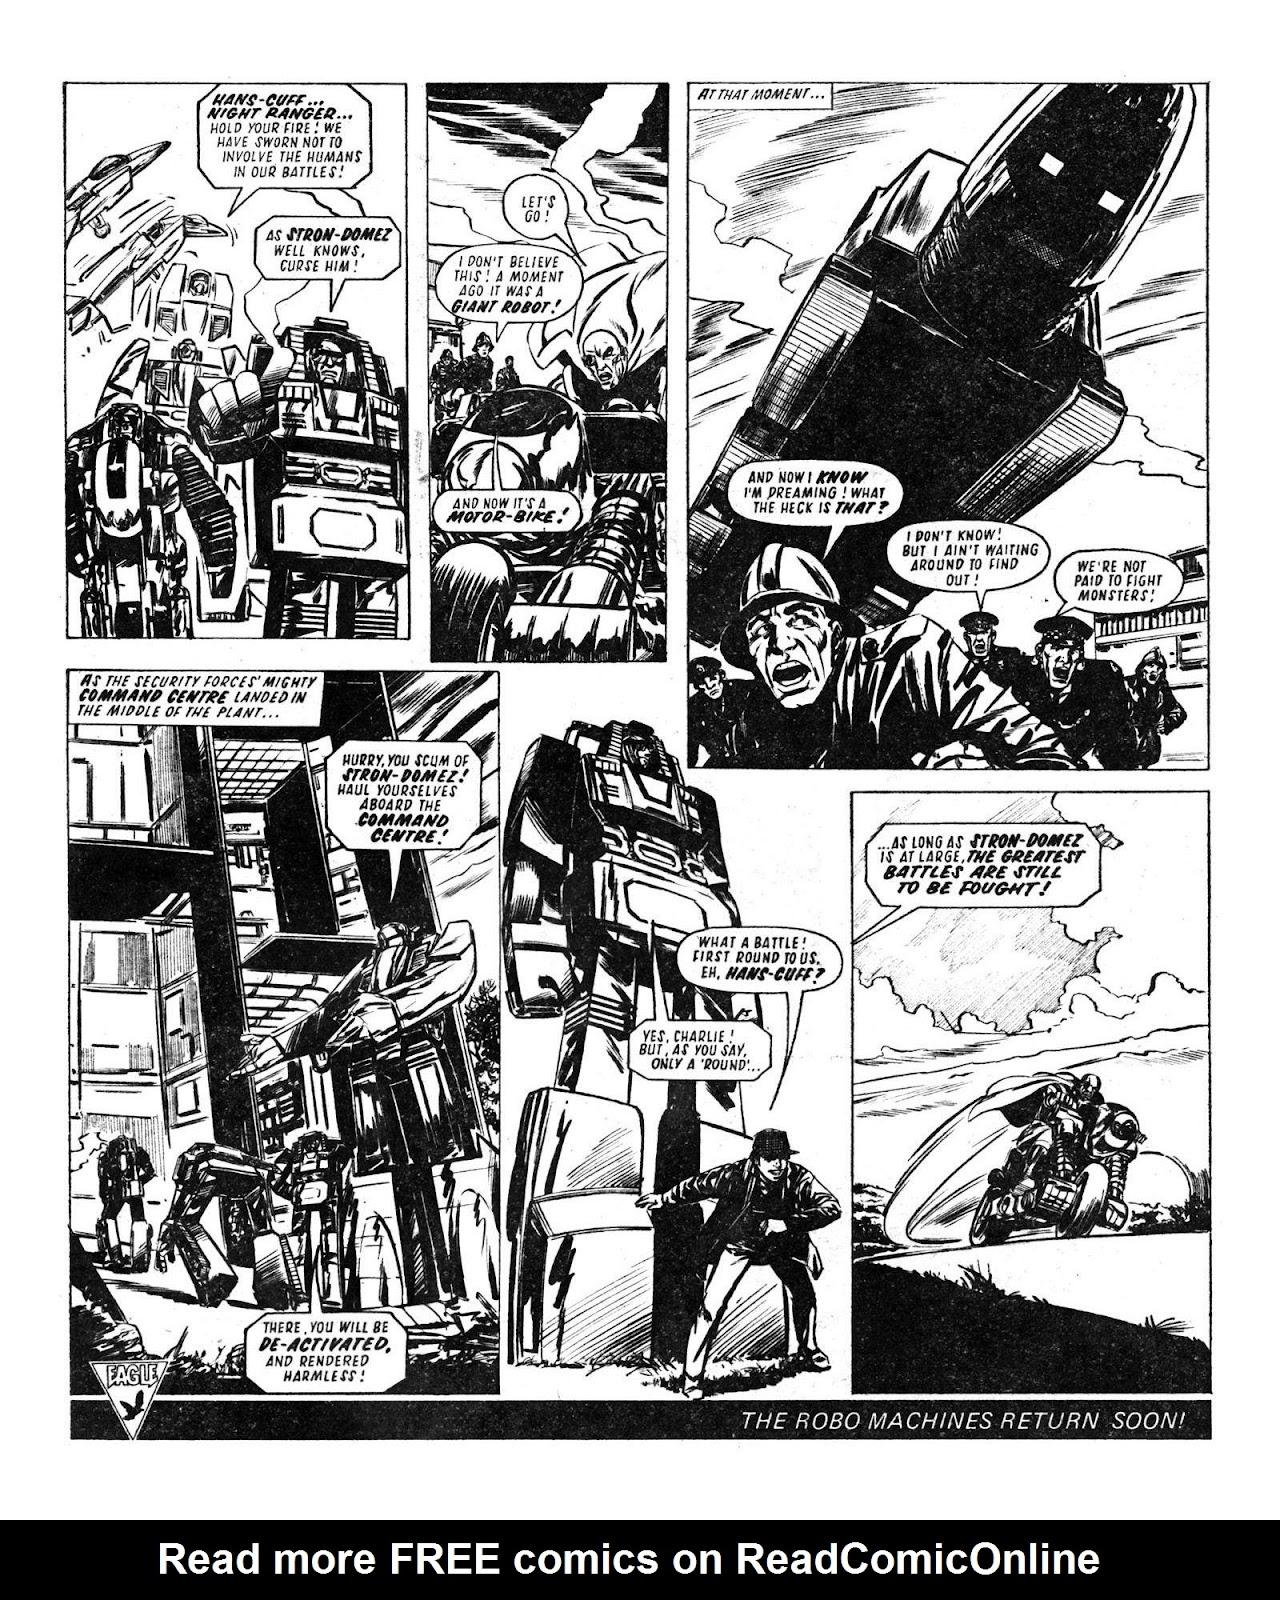 Read online Robo Machines comic -  Issue # TPB - 65